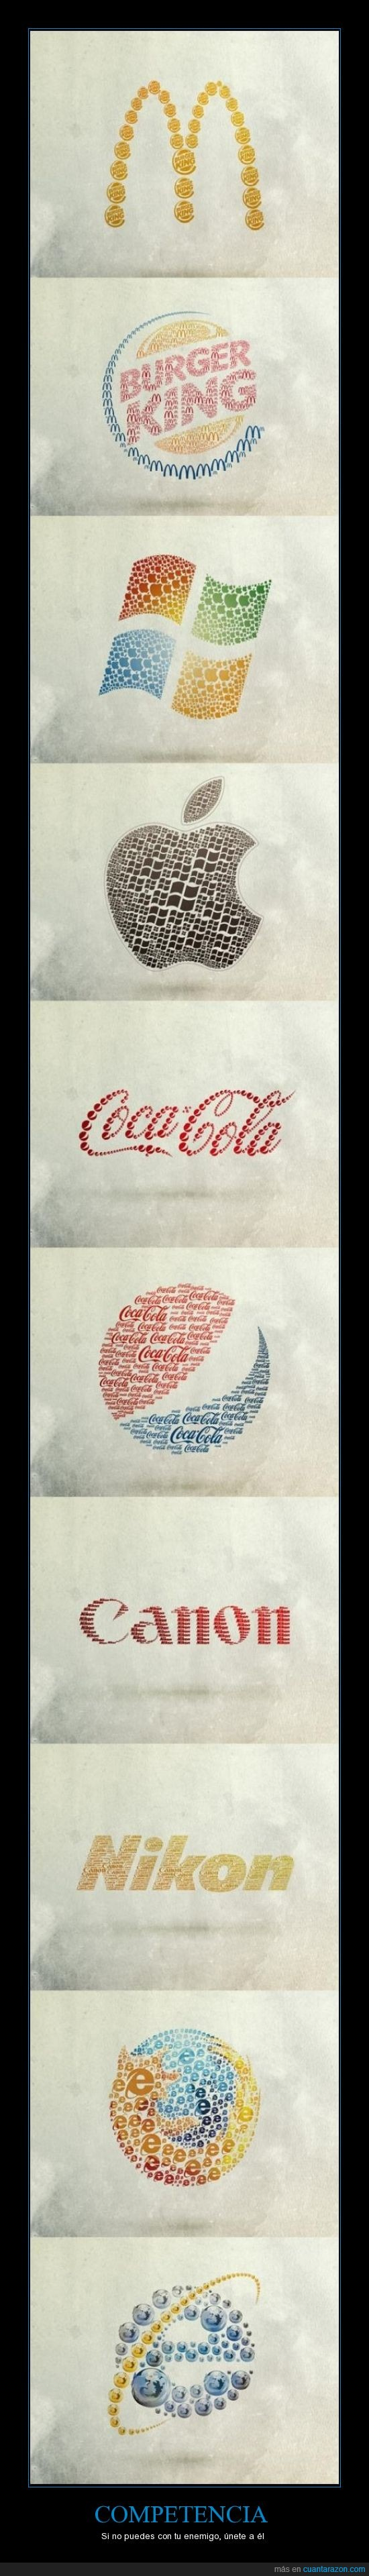 competencia,logos,rivales